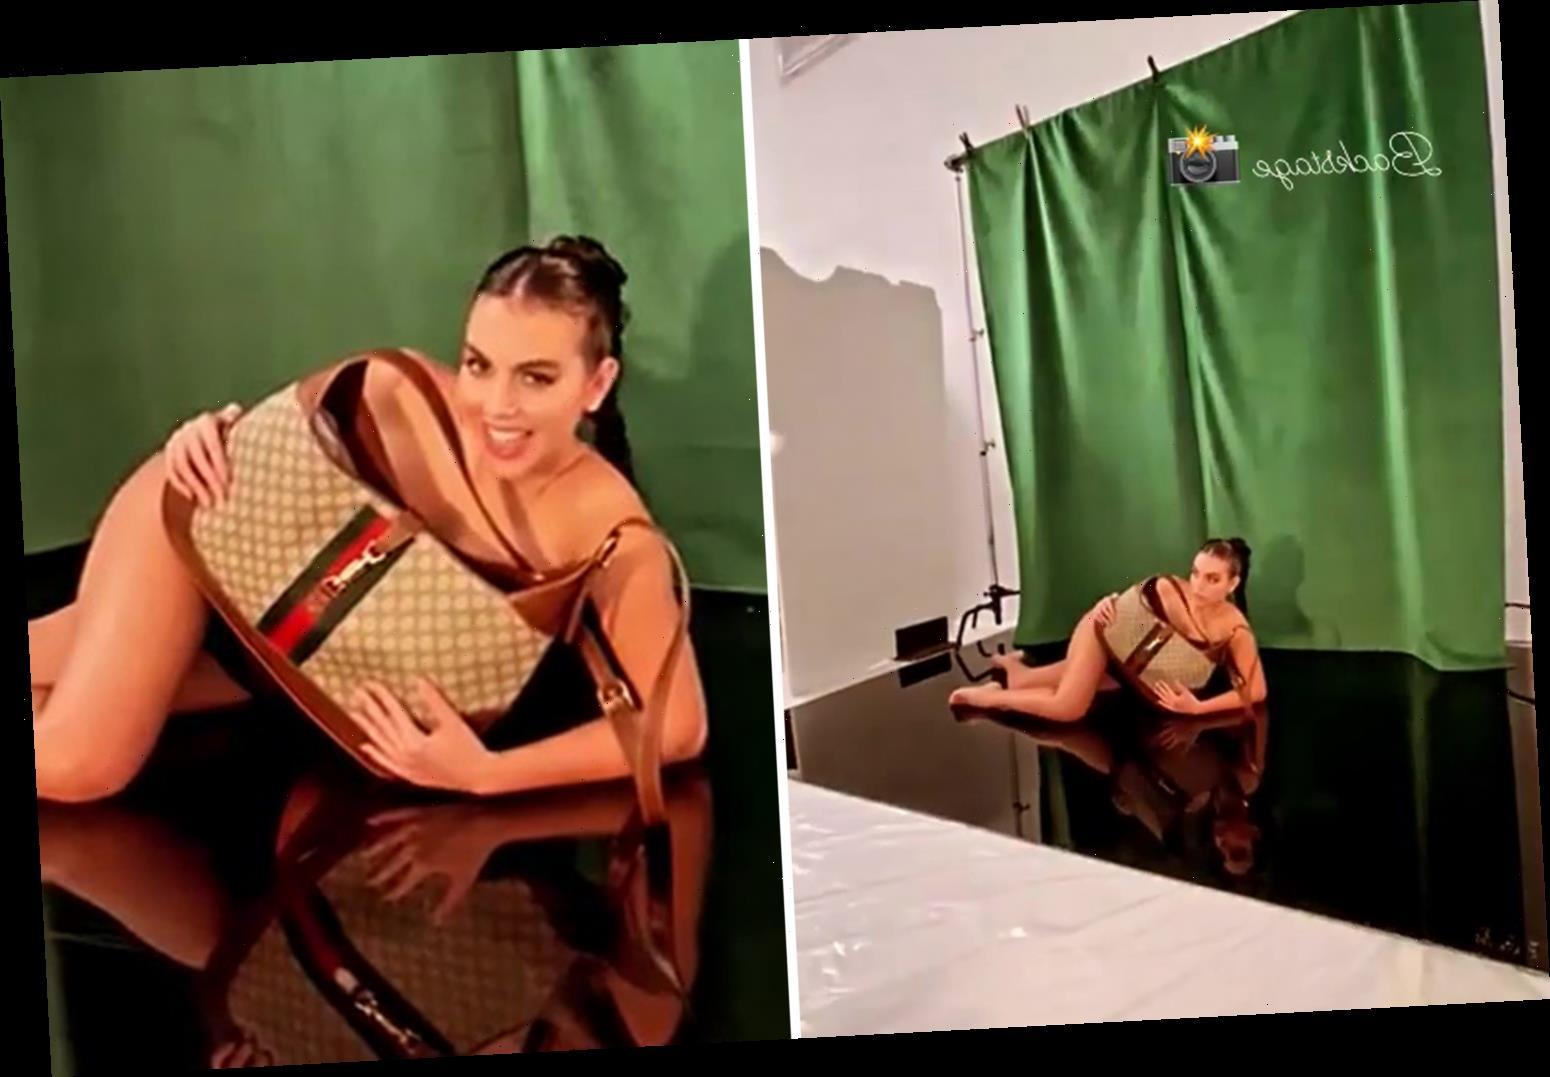 Watch naked Georgina Rodriguez cheekily wink at camera in clip of Cristiano Ronaldo's girlfriend's photo shoot